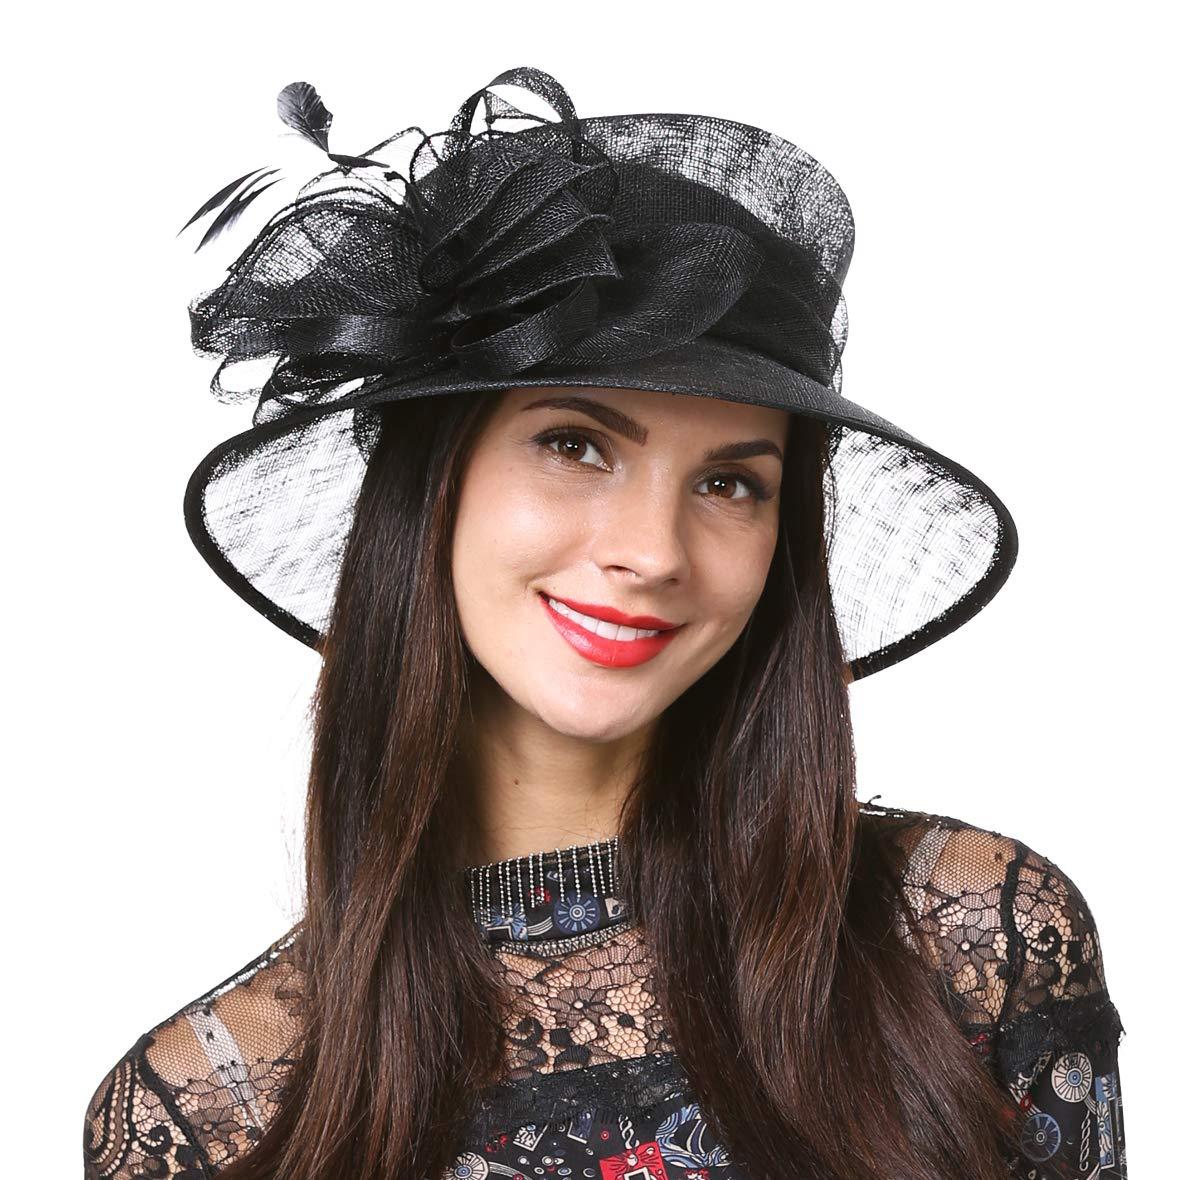 HISSHE Women's Derby Church Dress Weddding Bridal Fascinator 1920s Sinamay Bucket Hat (Black)